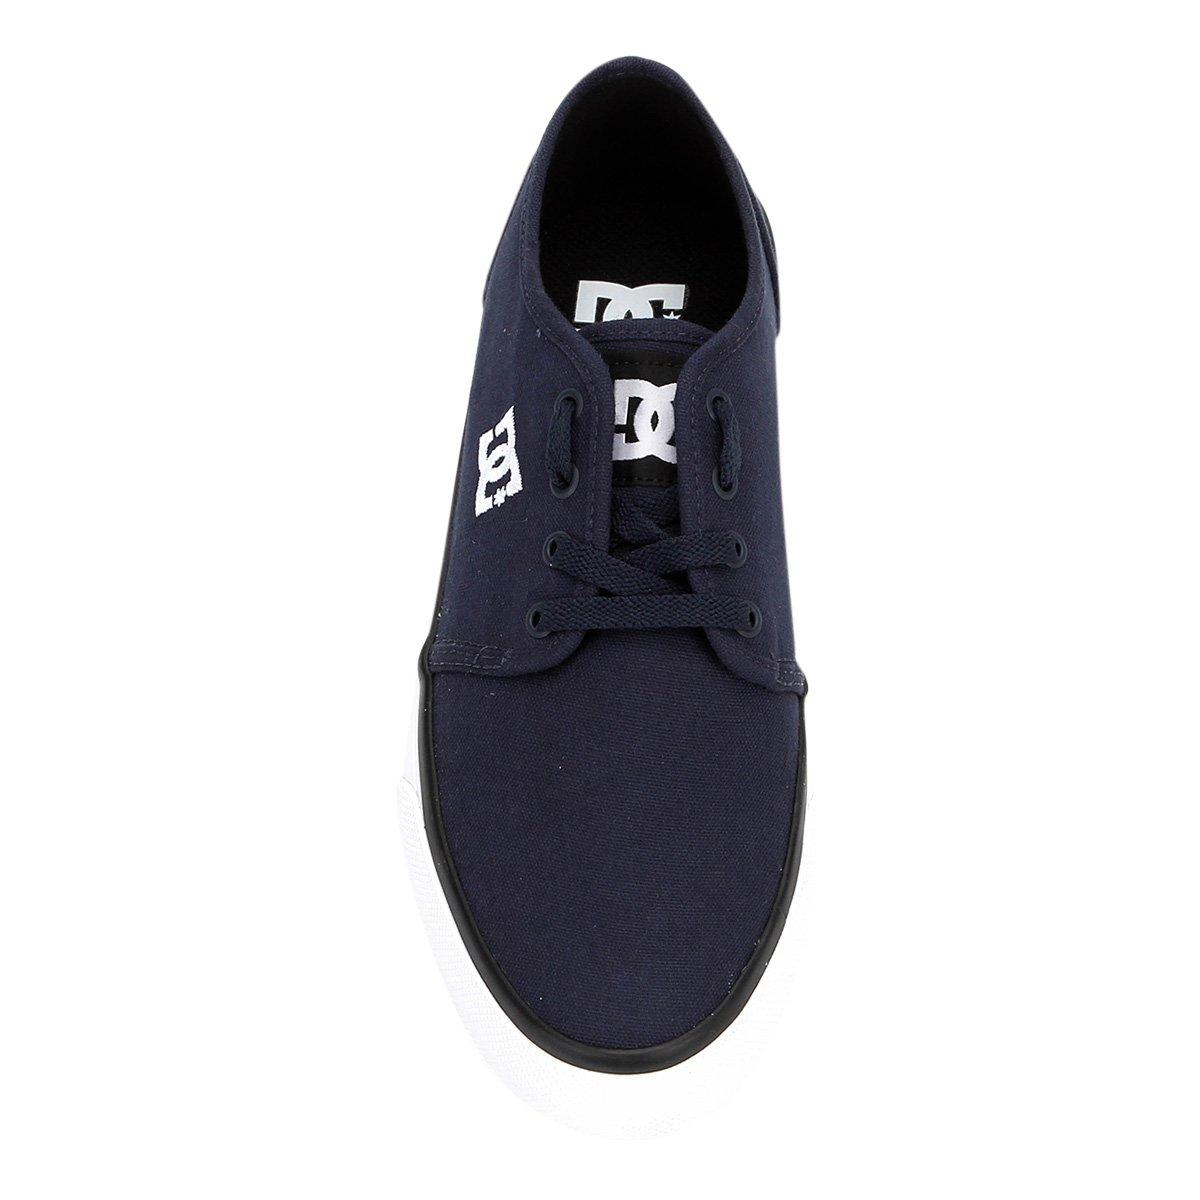 d1785cede0 Tênis DC Shoes Studio Tx La Masculino - Tam: 43 - Shopping TudoAzul